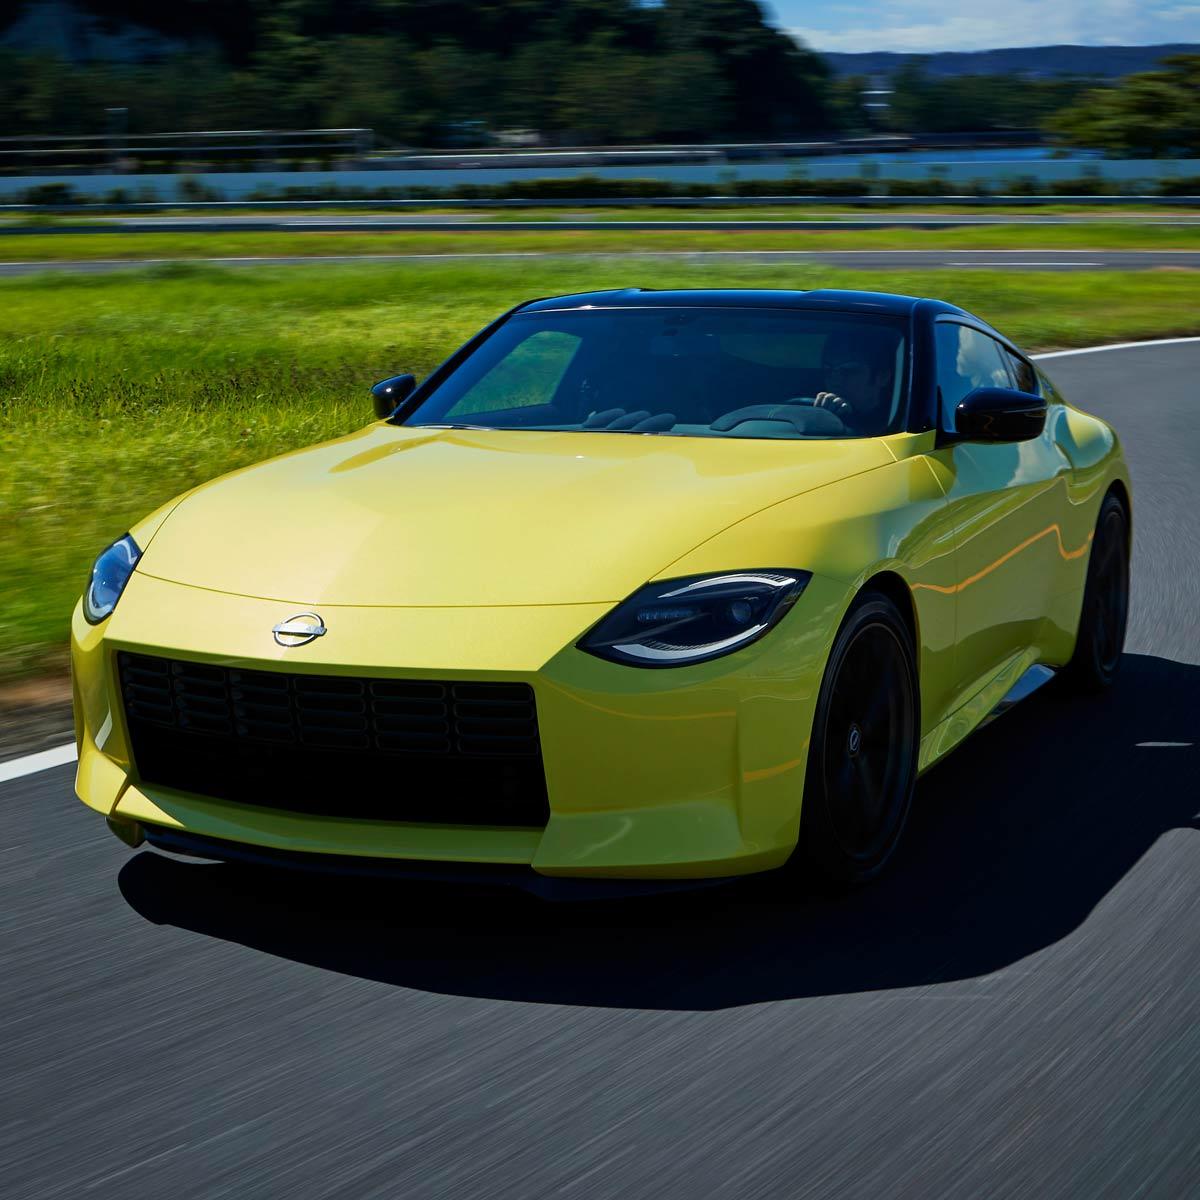 V6ツインターボに6MT採用!日産 新型「フェアレディZ」プロトタイプ世界初公開